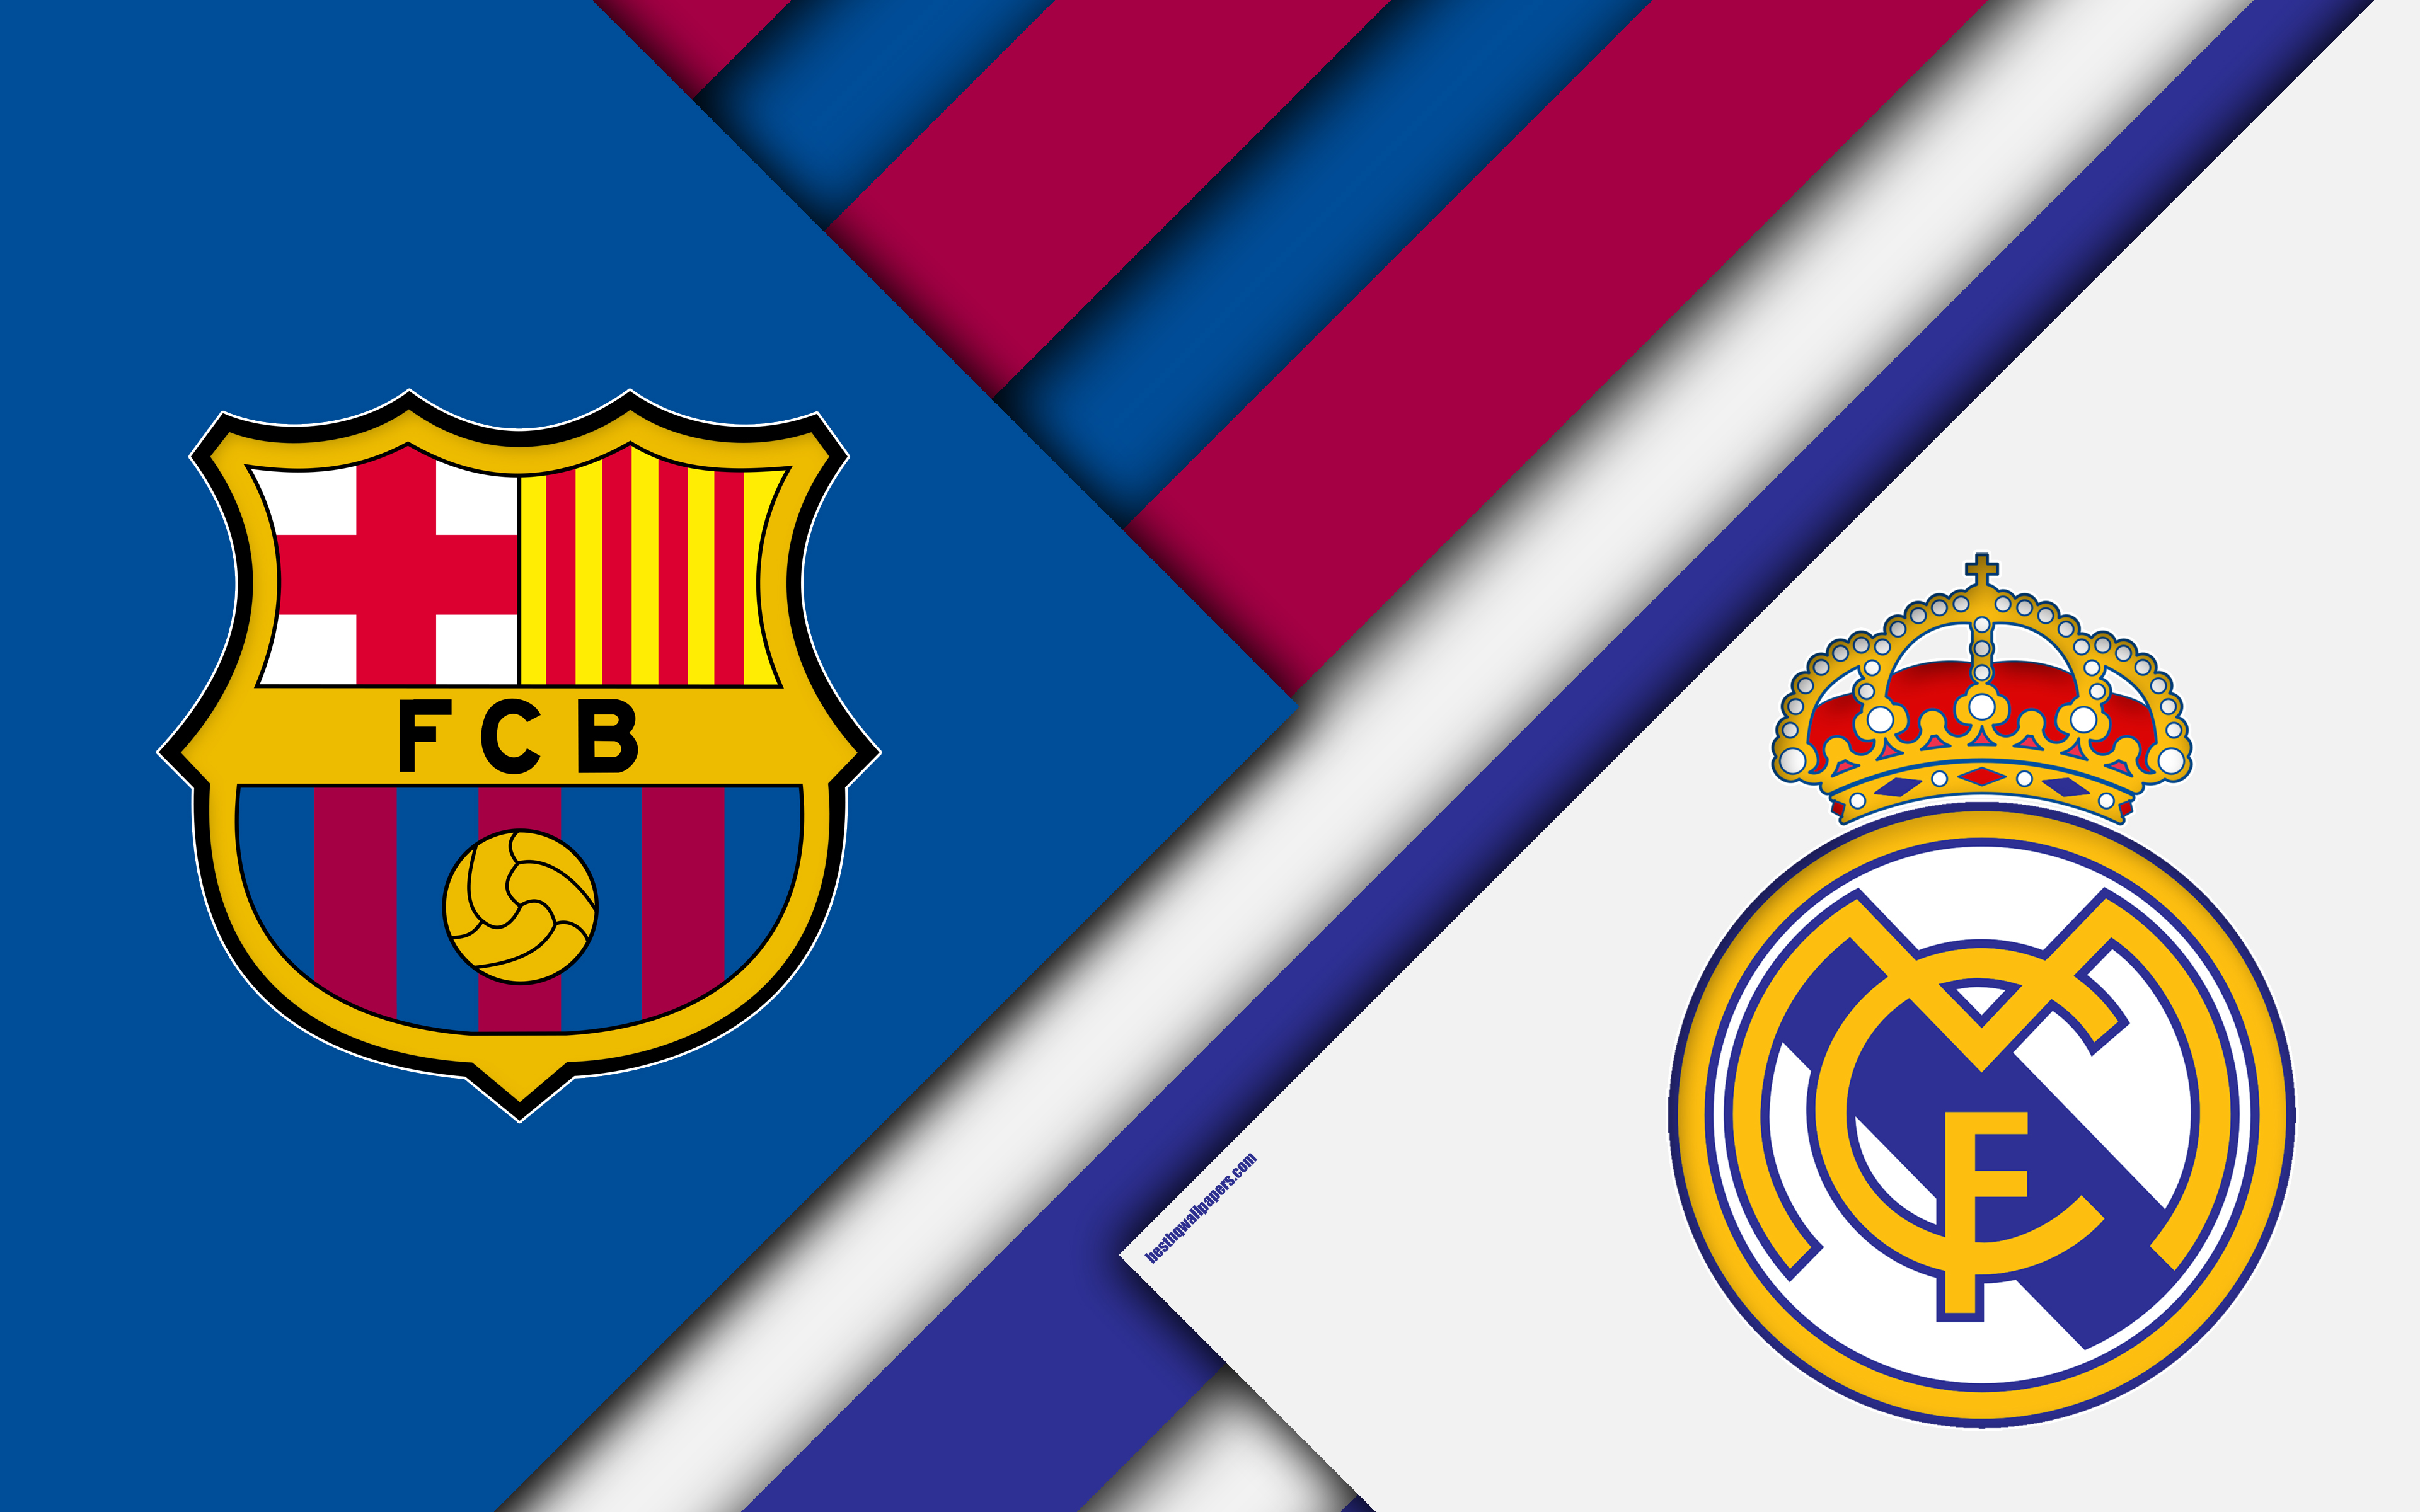 Fc Barcelona Vs Real Madrid, El Clasico, 4k, Logos, - El Clasico 2019 La Liga , HD Wallpaper & Backgrounds